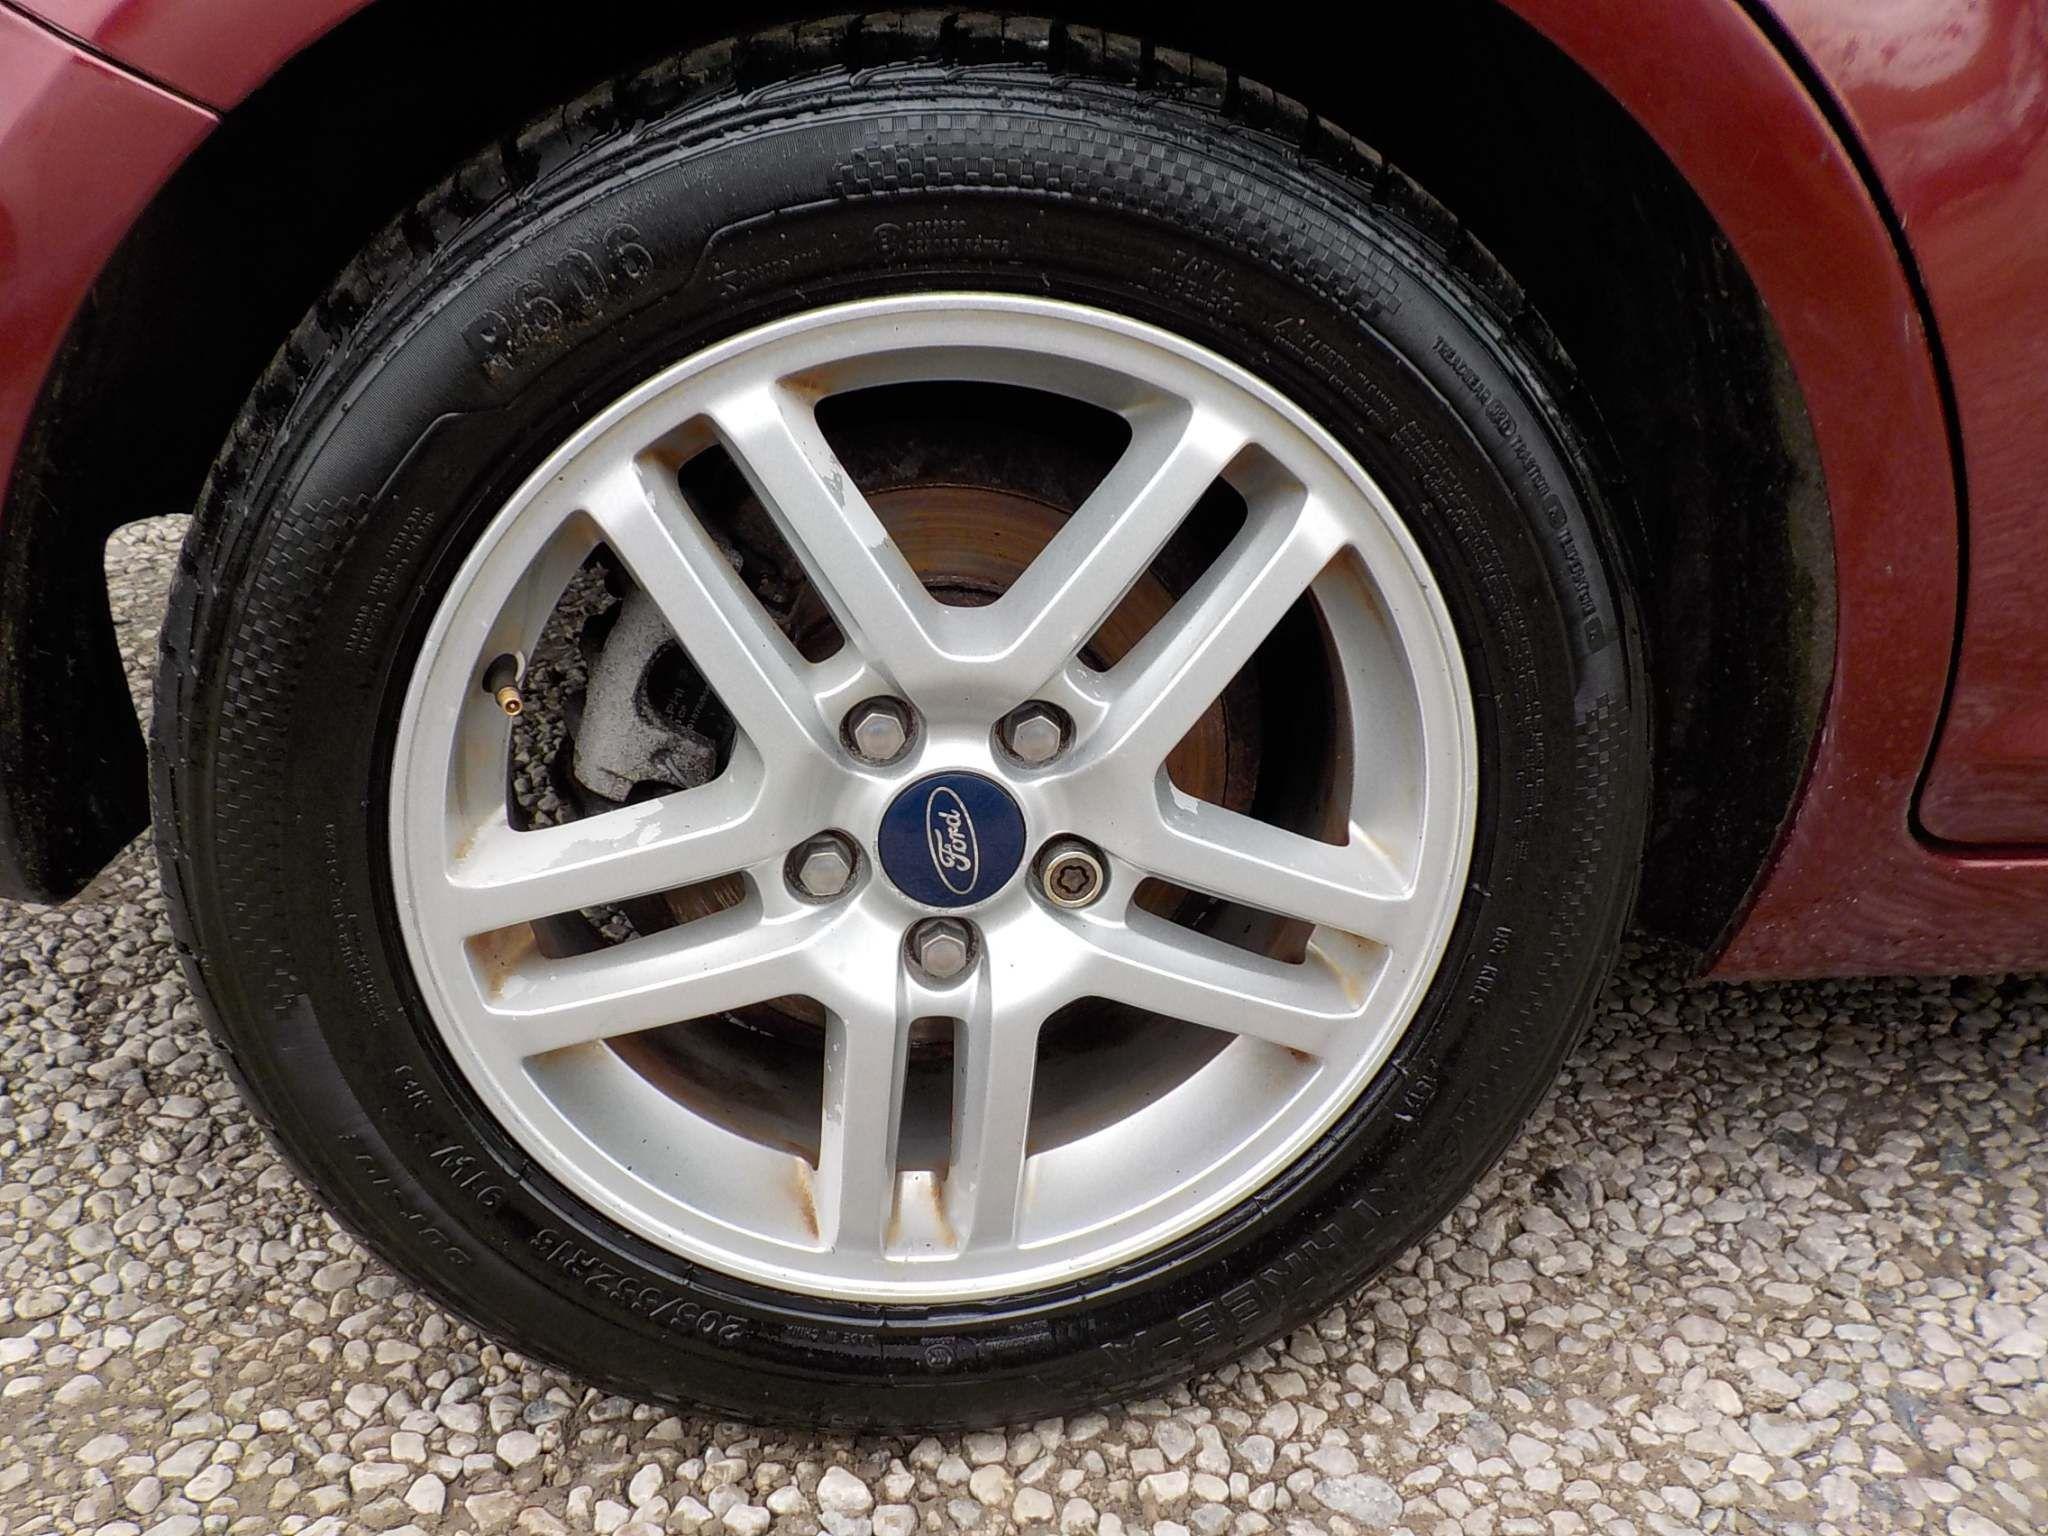 Ford Focus C-Max 1.6 16v Zetec 5dr